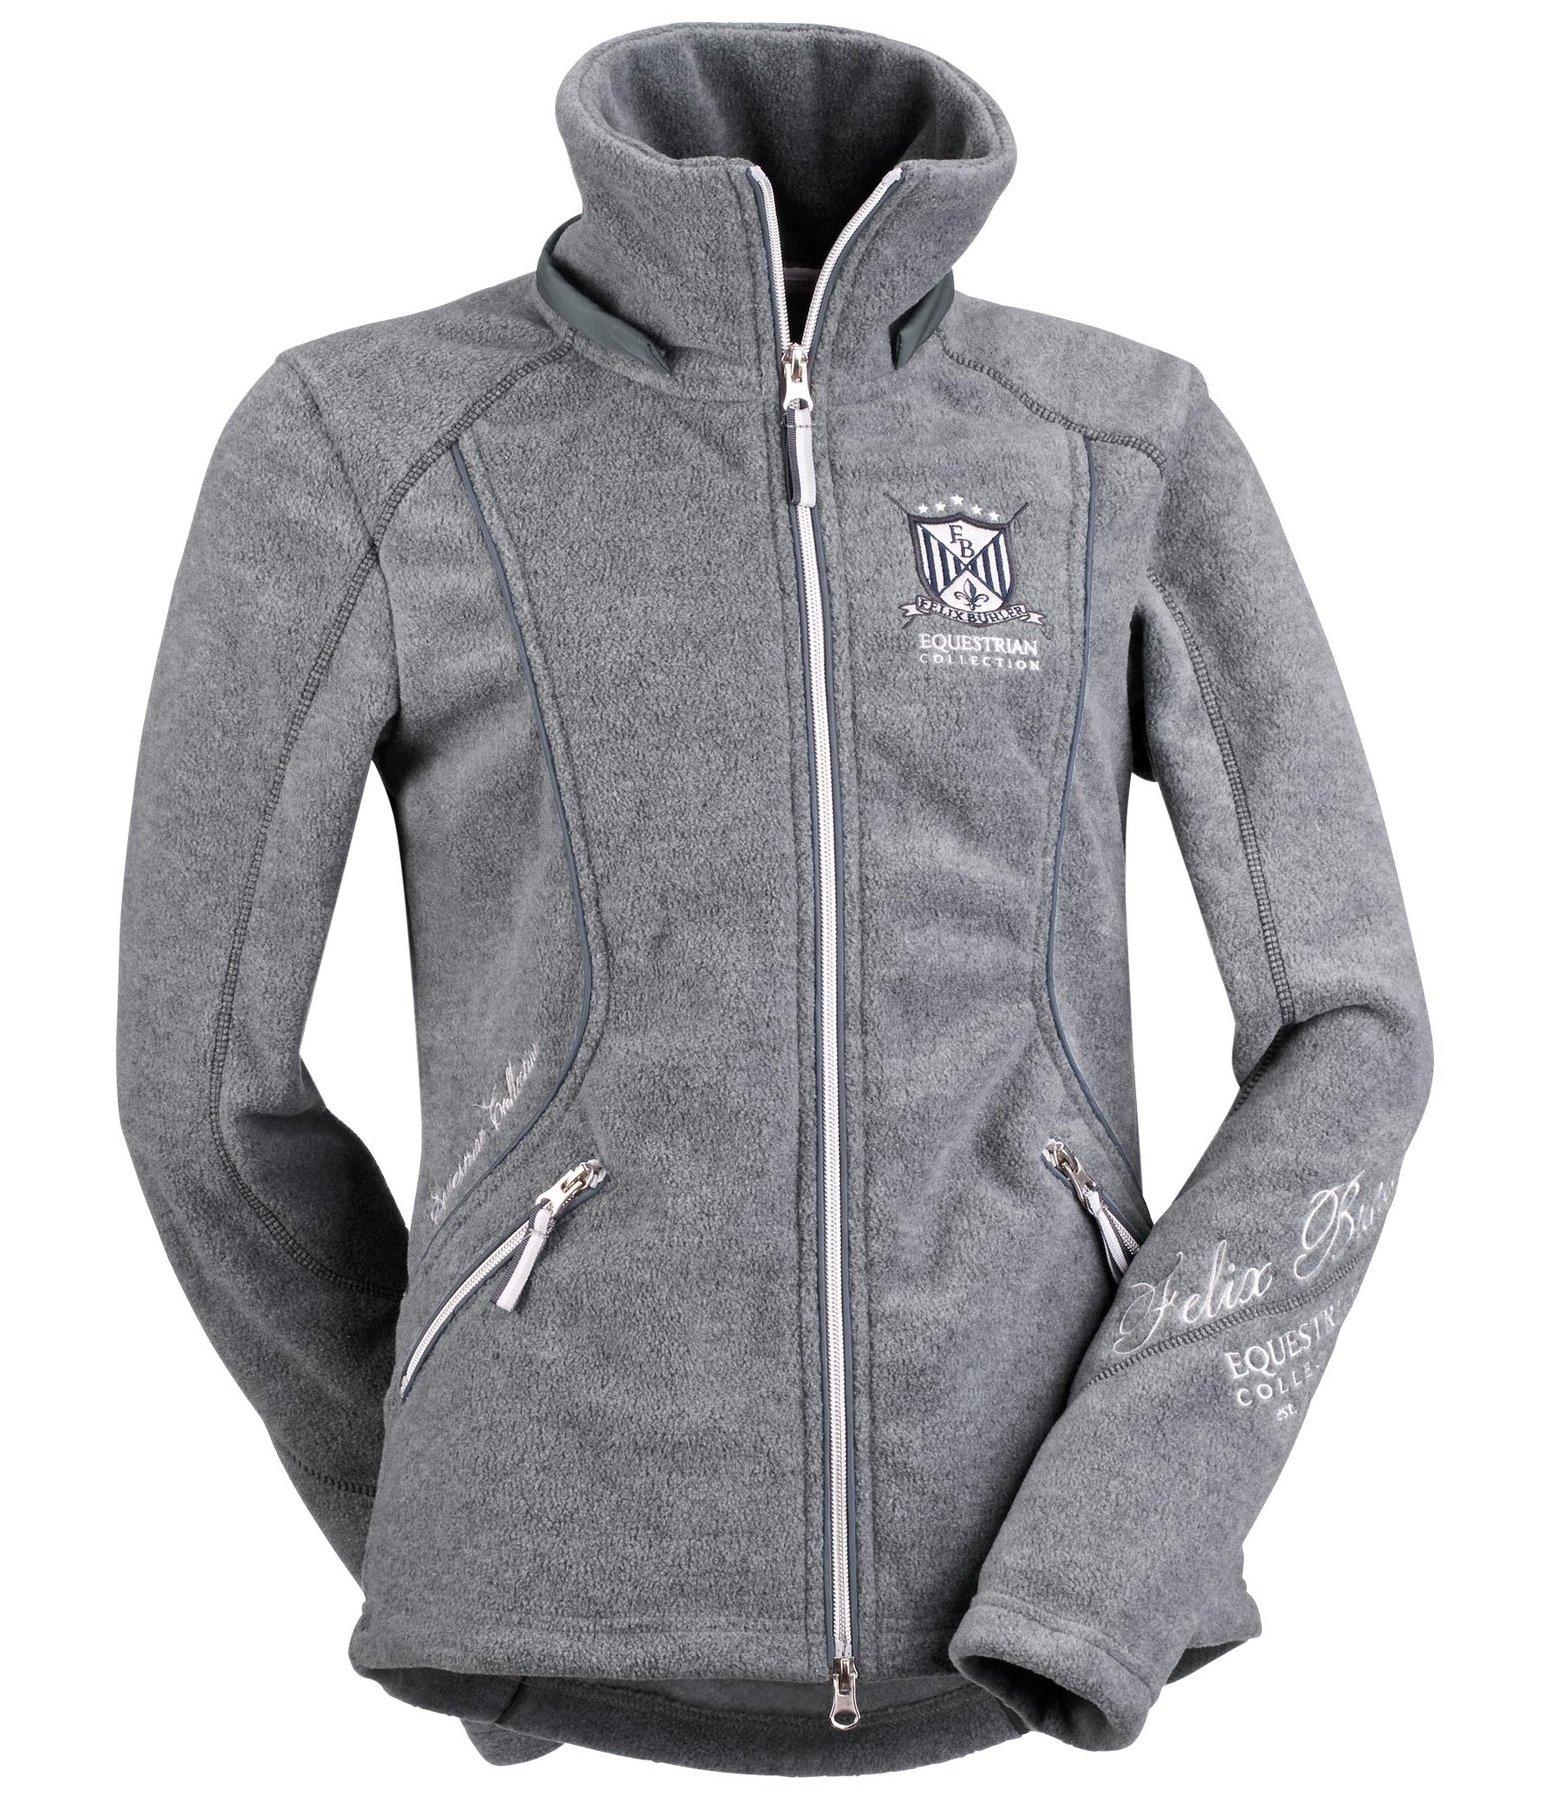 hooded fleece jacket suzy fleece jackets kramer equestrian. Black Bedroom Furniture Sets. Home Design Ideas